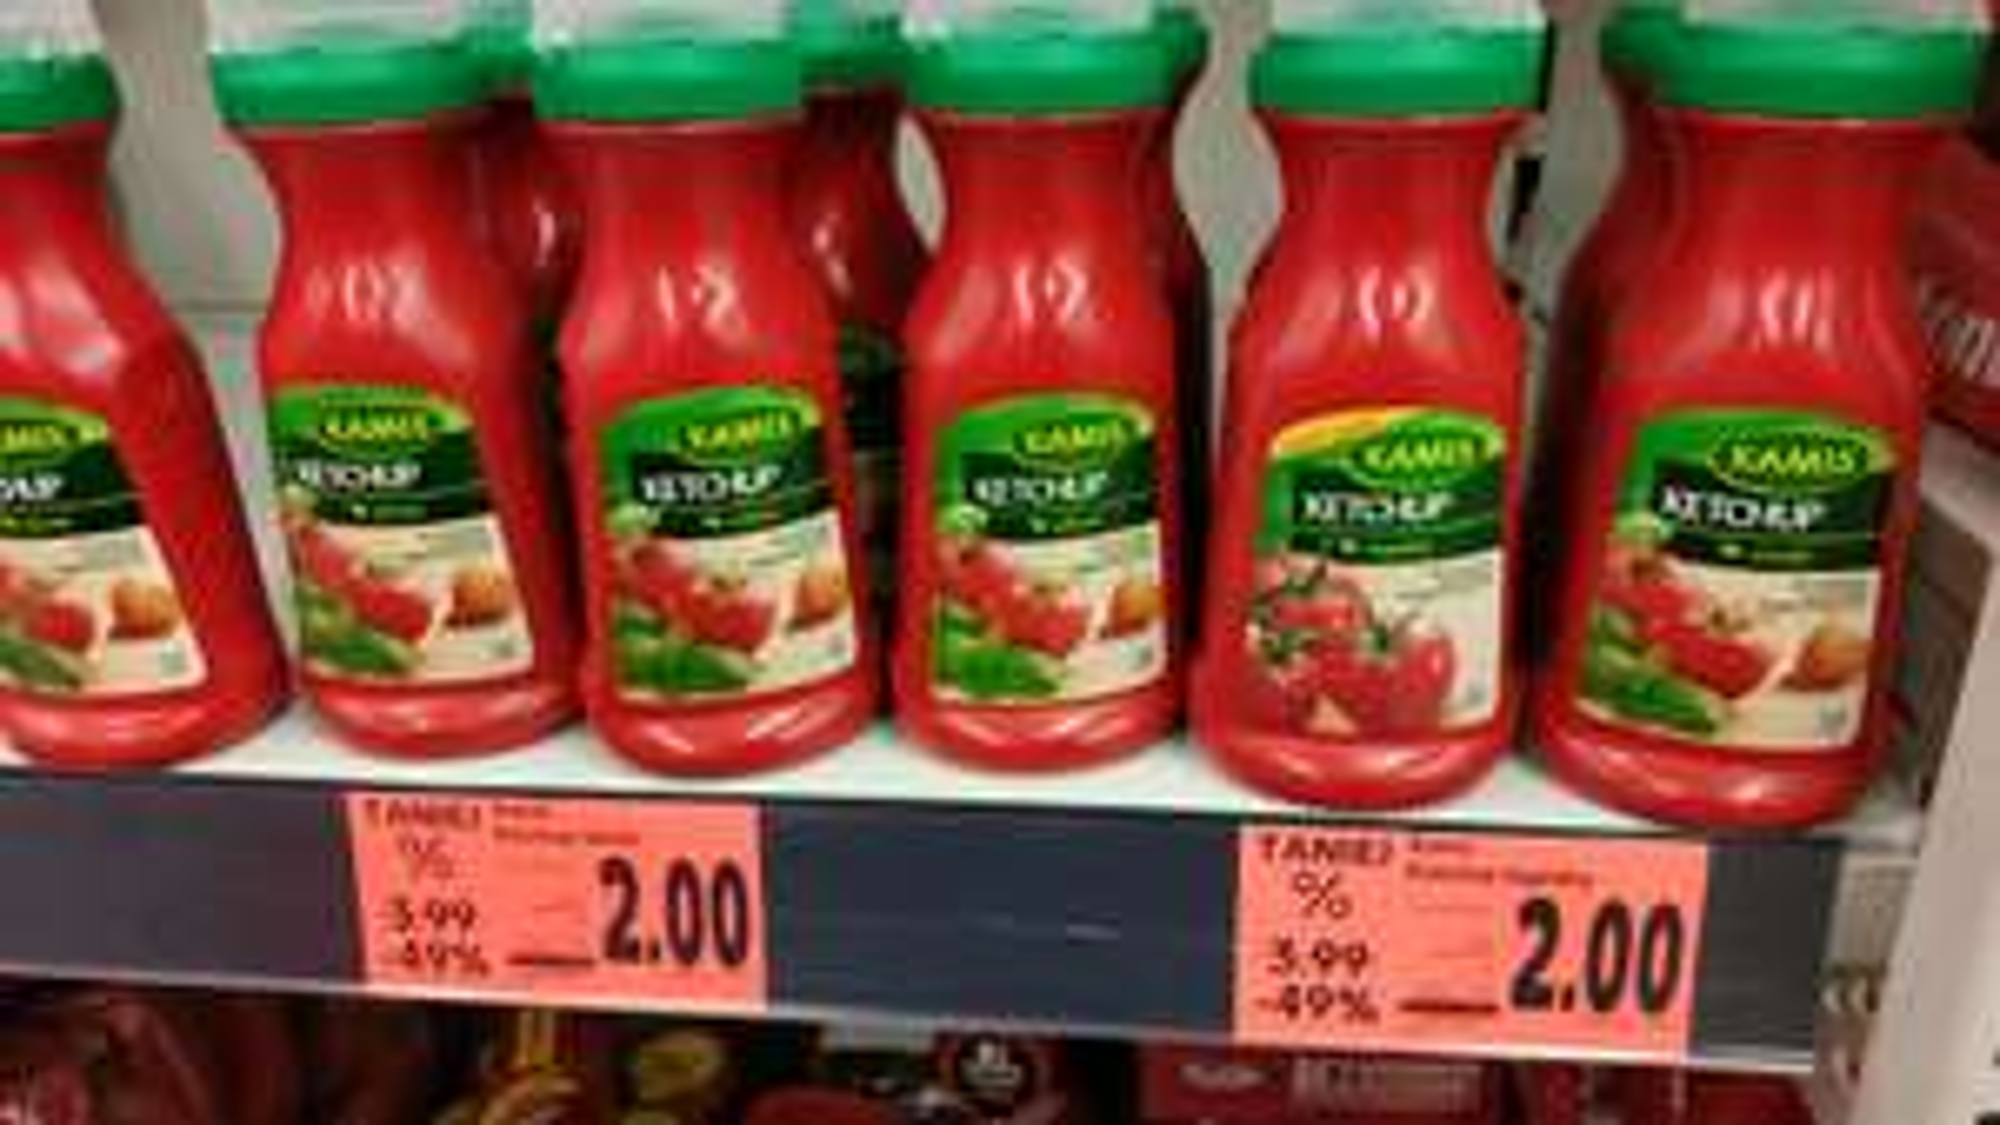 Ketchup Kamis 350g Kaufland